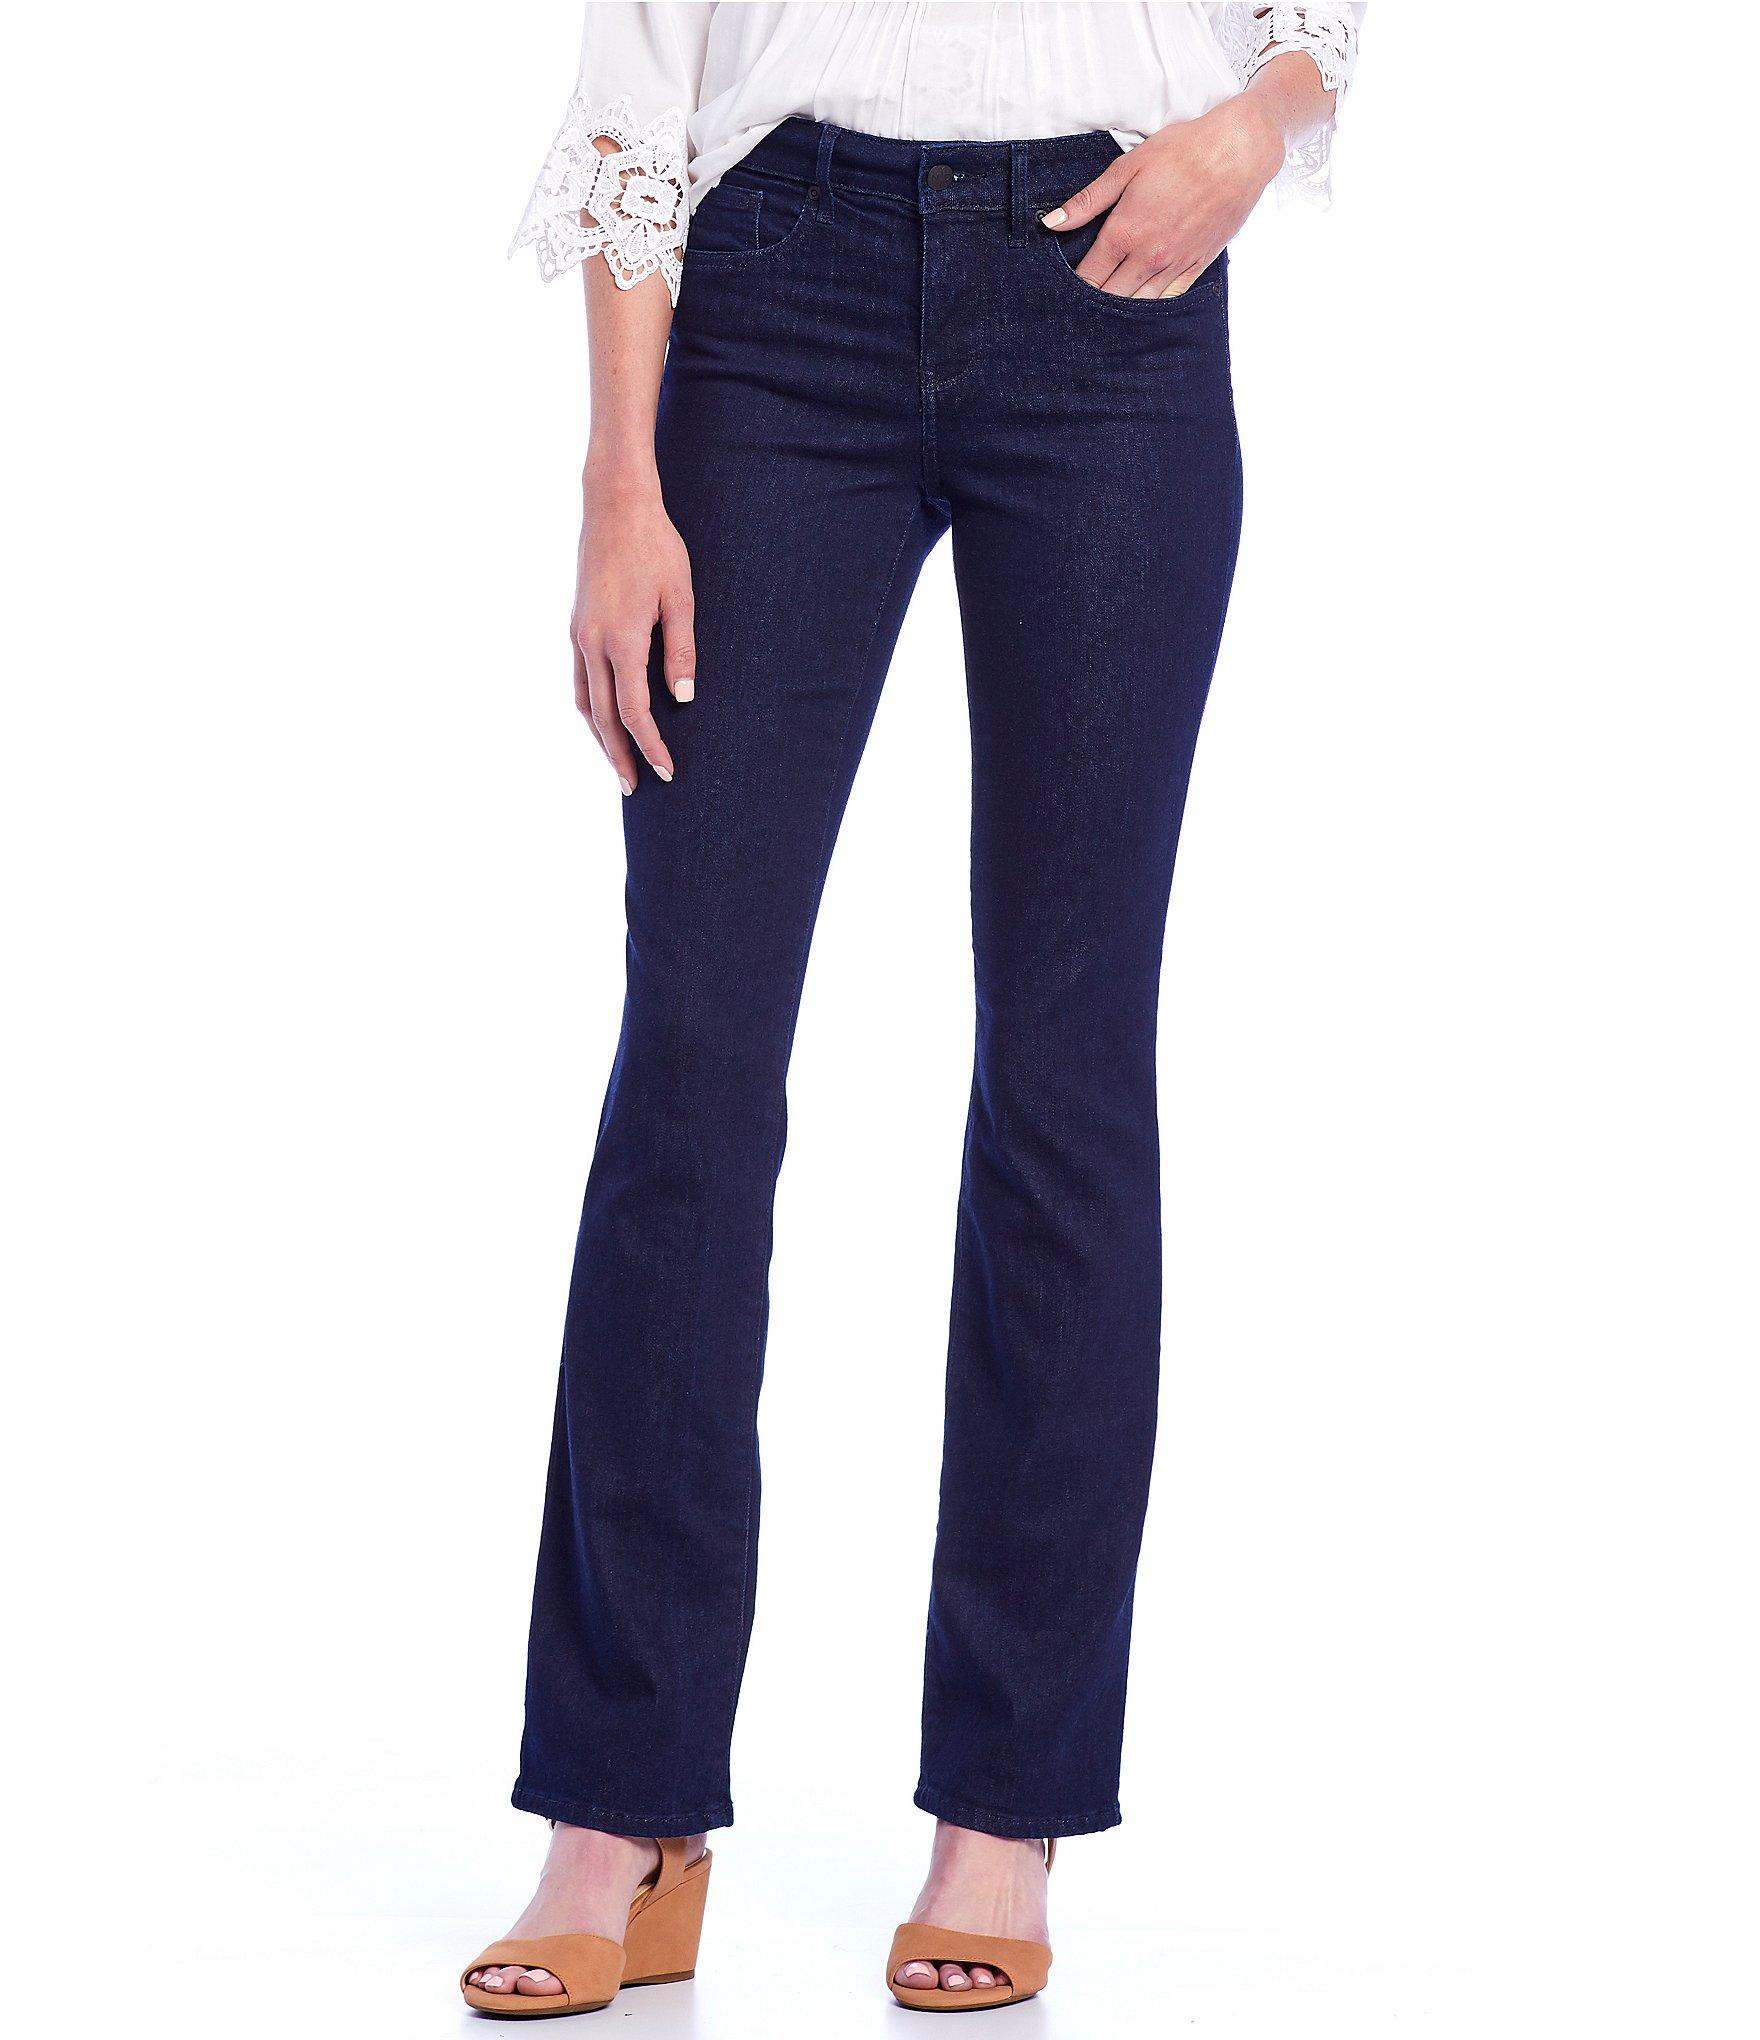 Dillards Womens Jeans